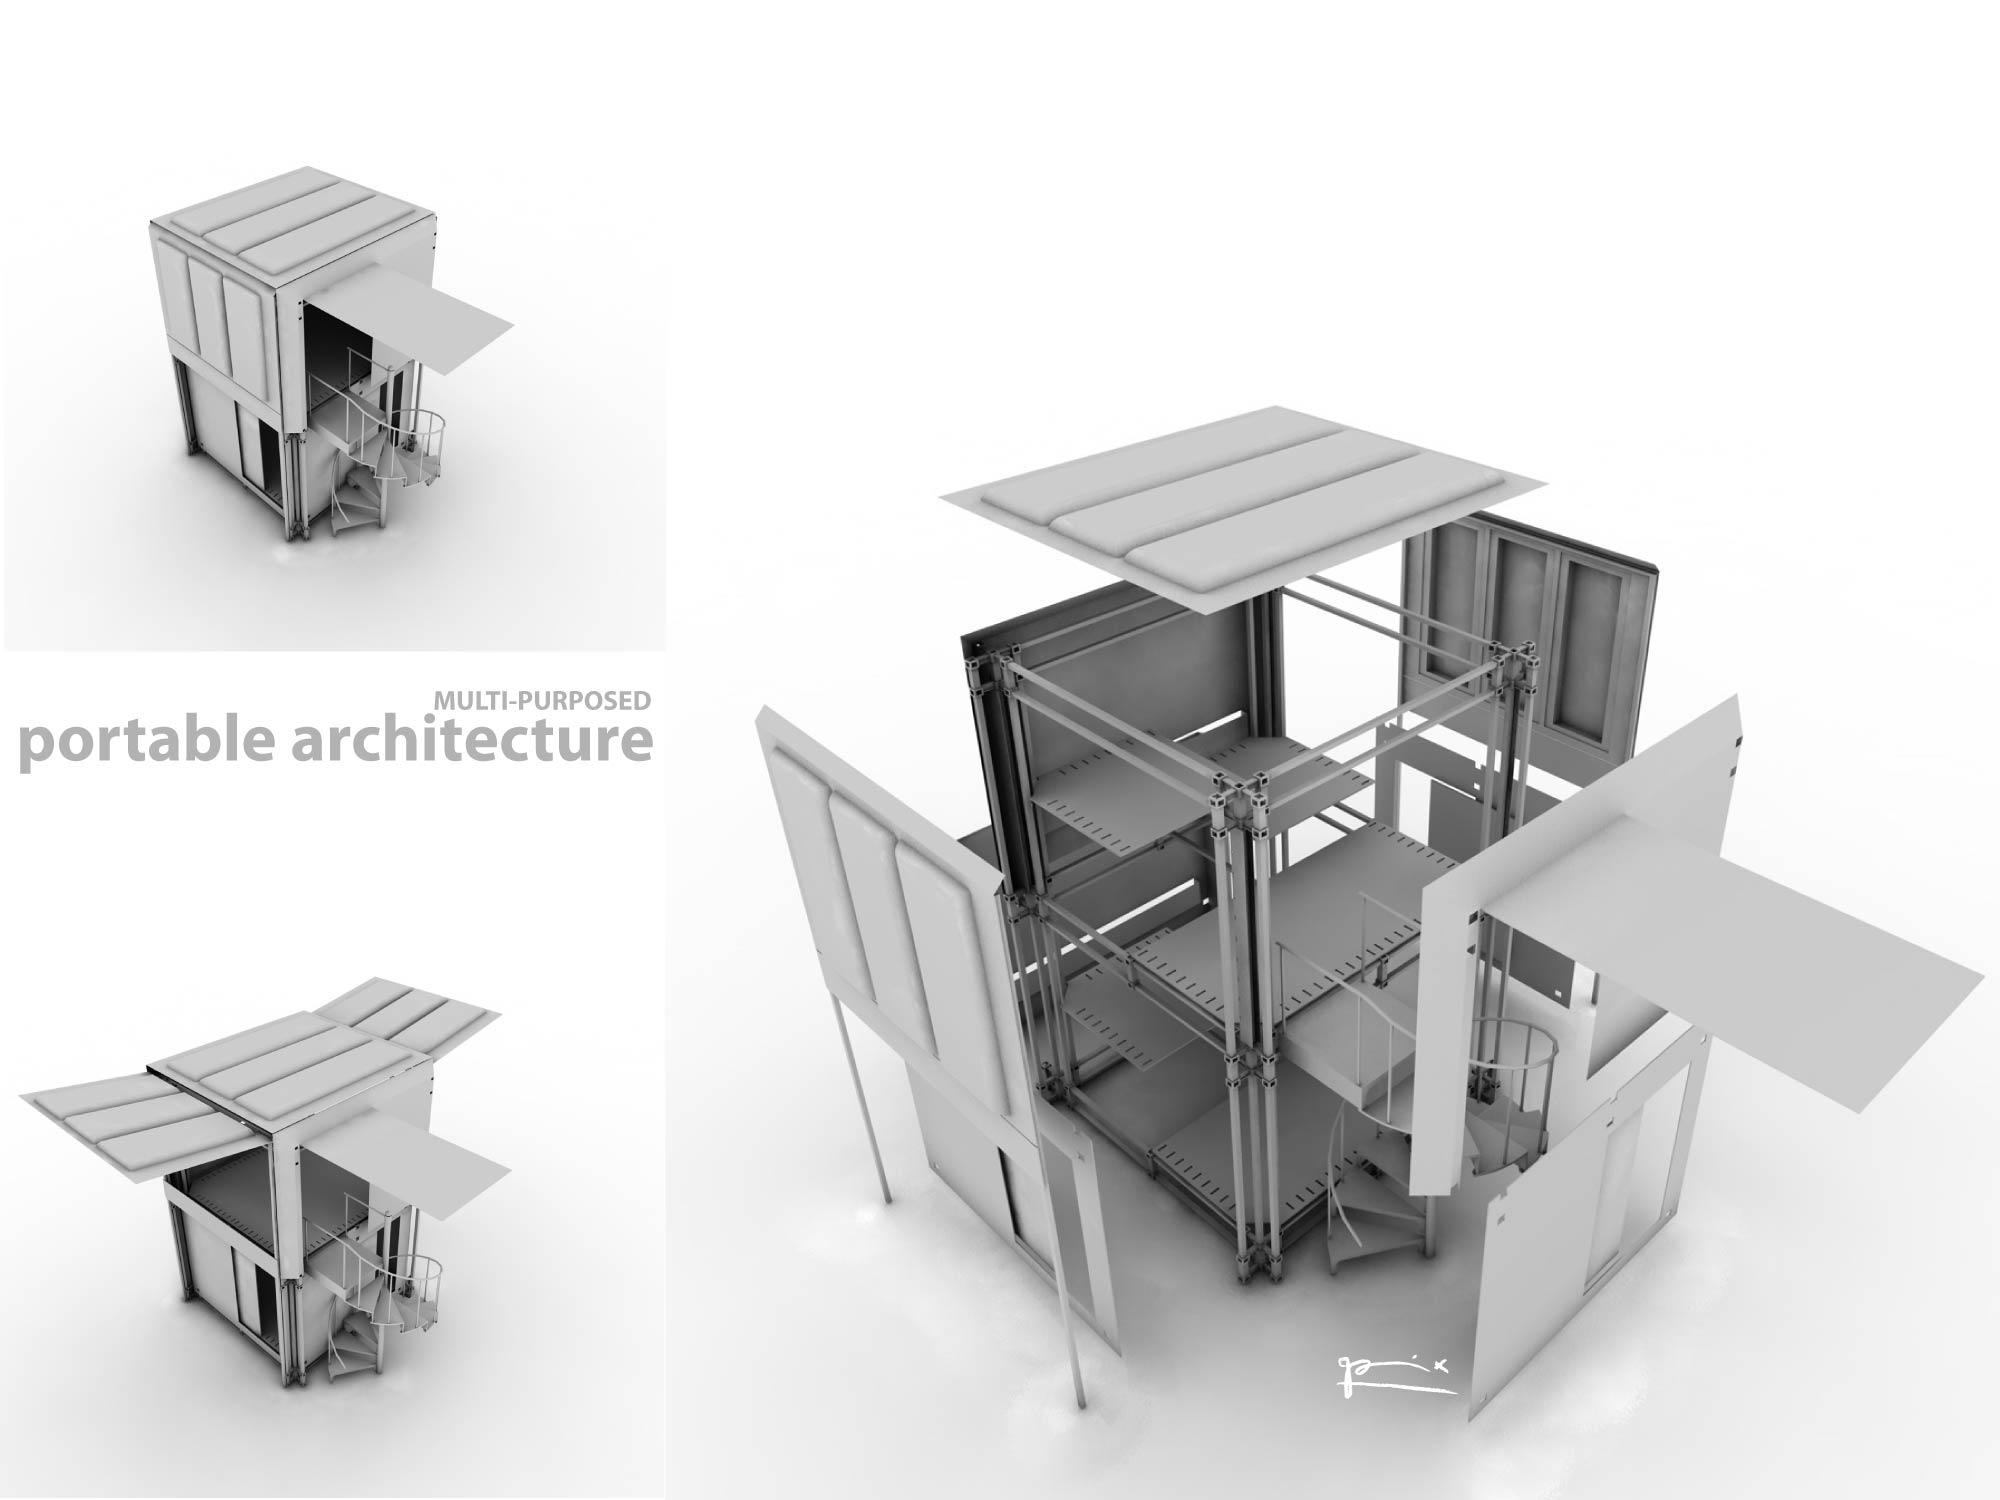 portable architecture by picopix on deviantart. Black Bedroom Furniture Sets. Home Design Ideas